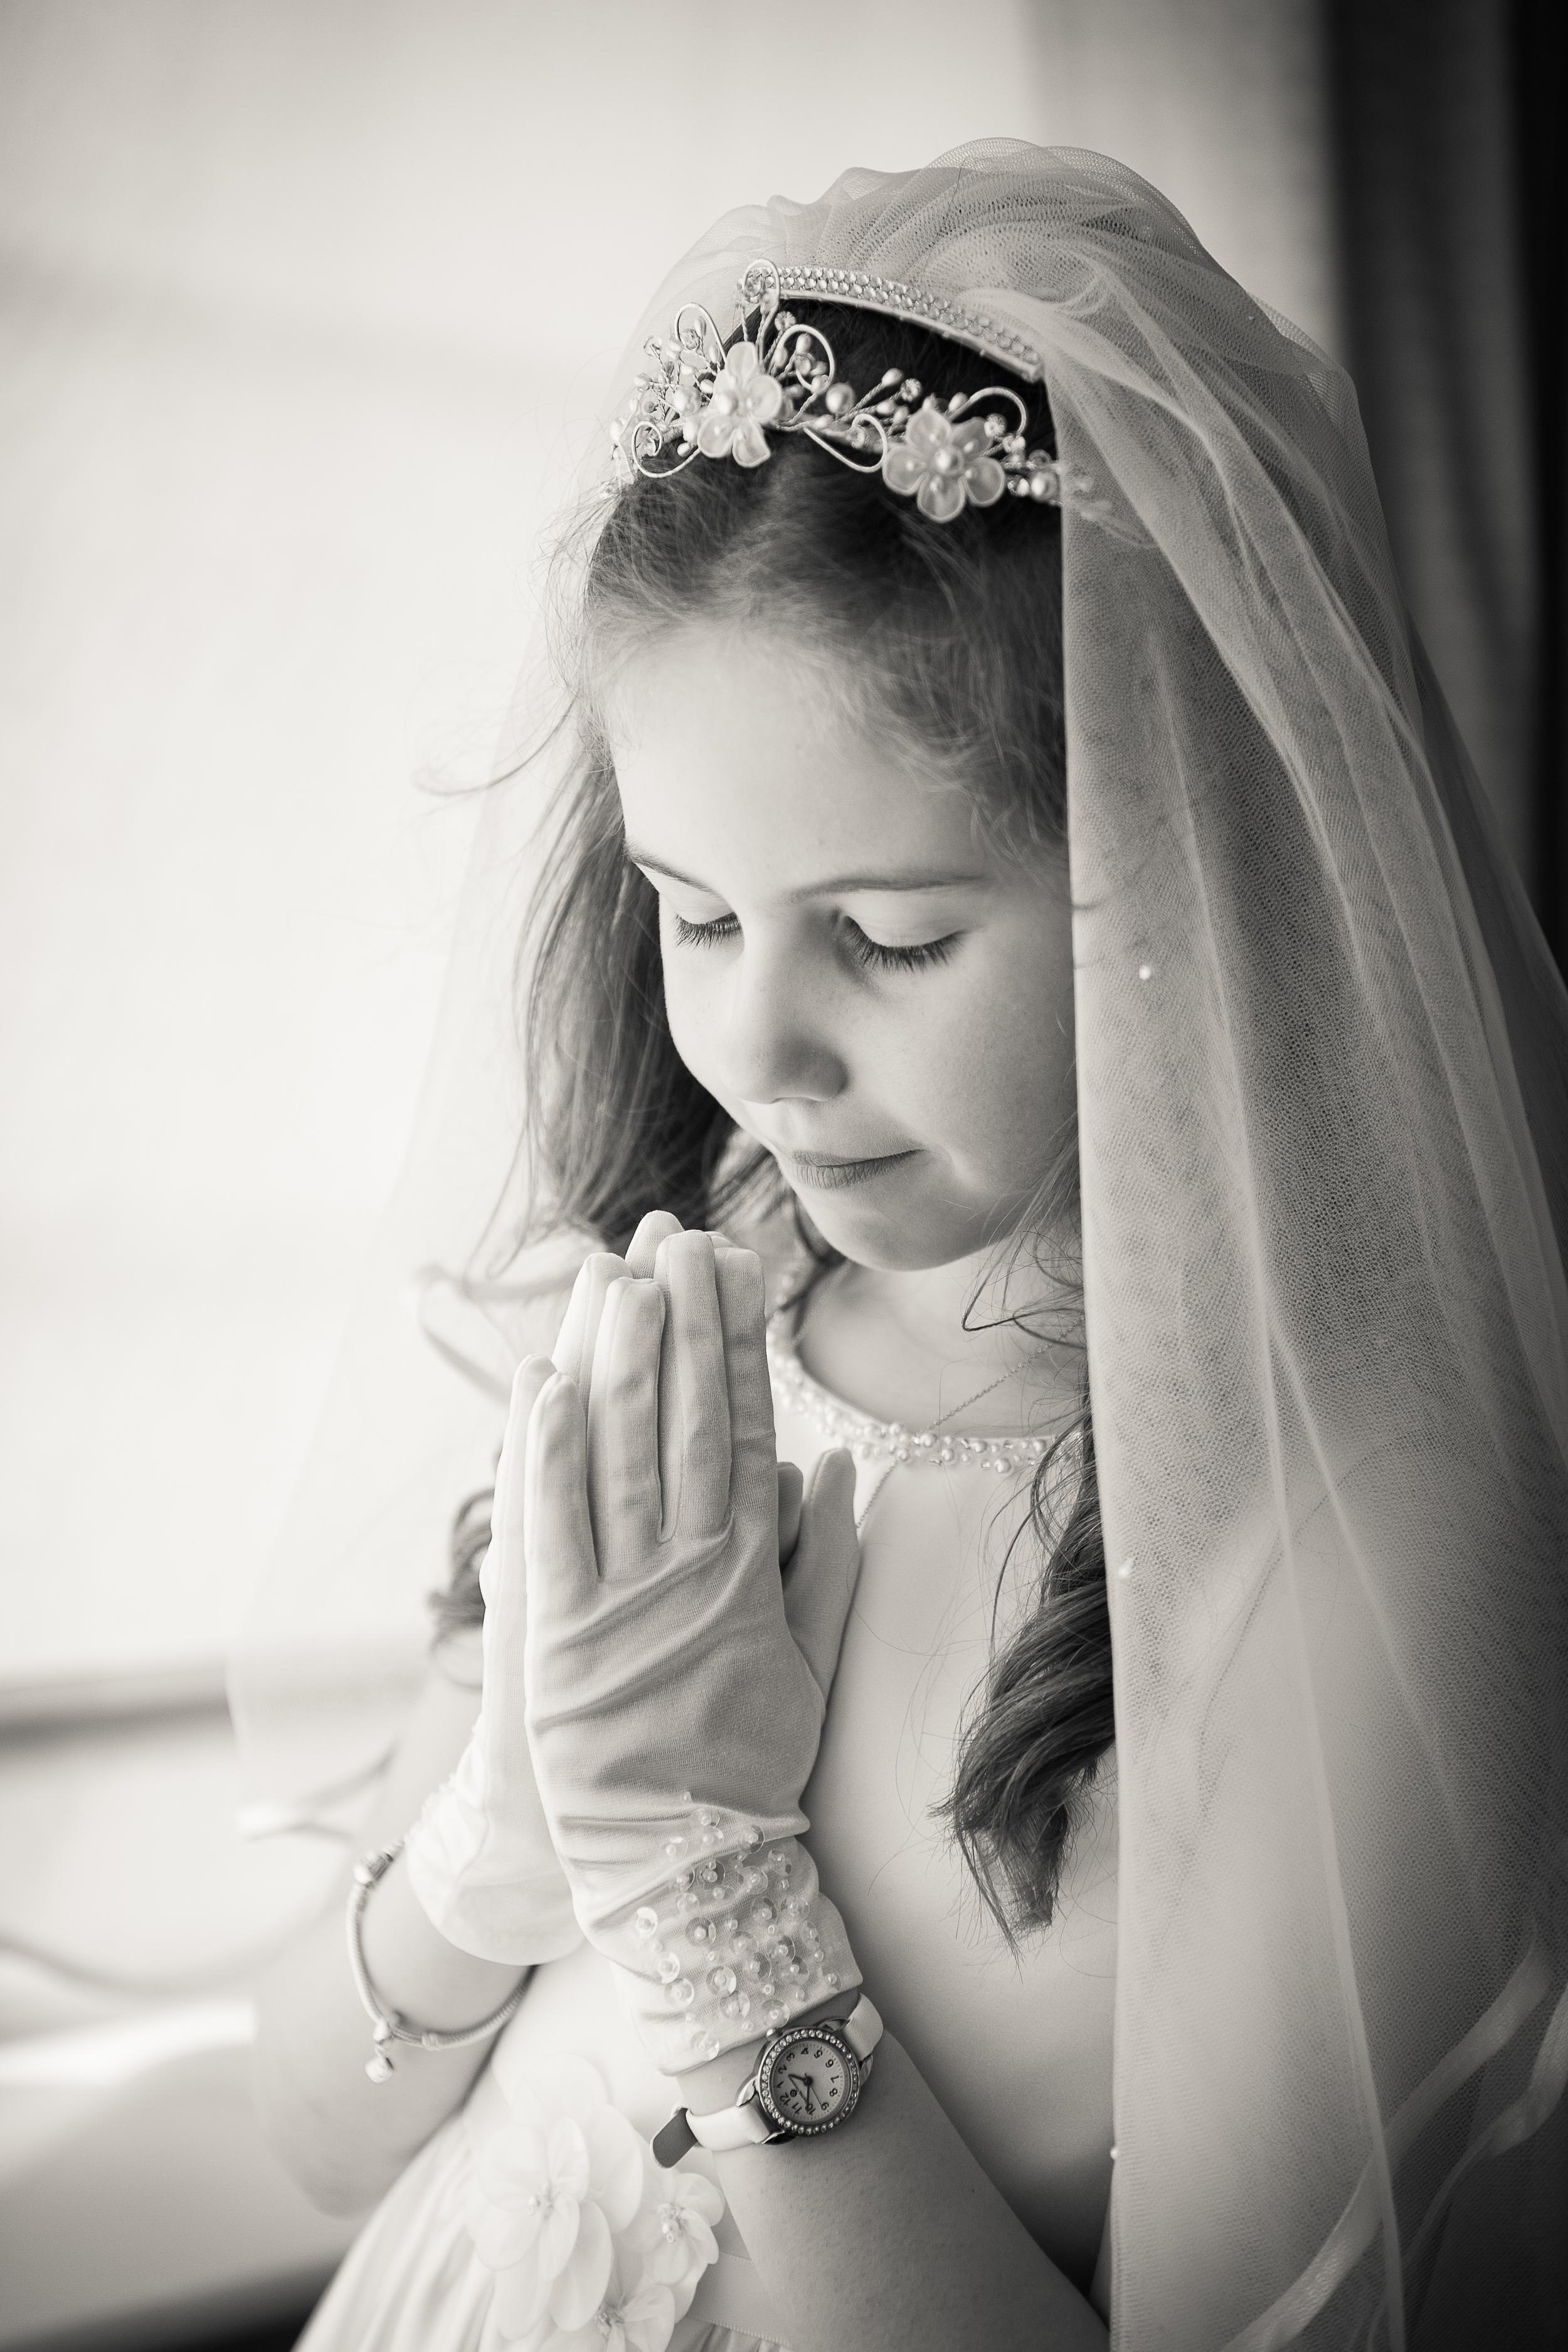 Sophie in prayer portrait at home